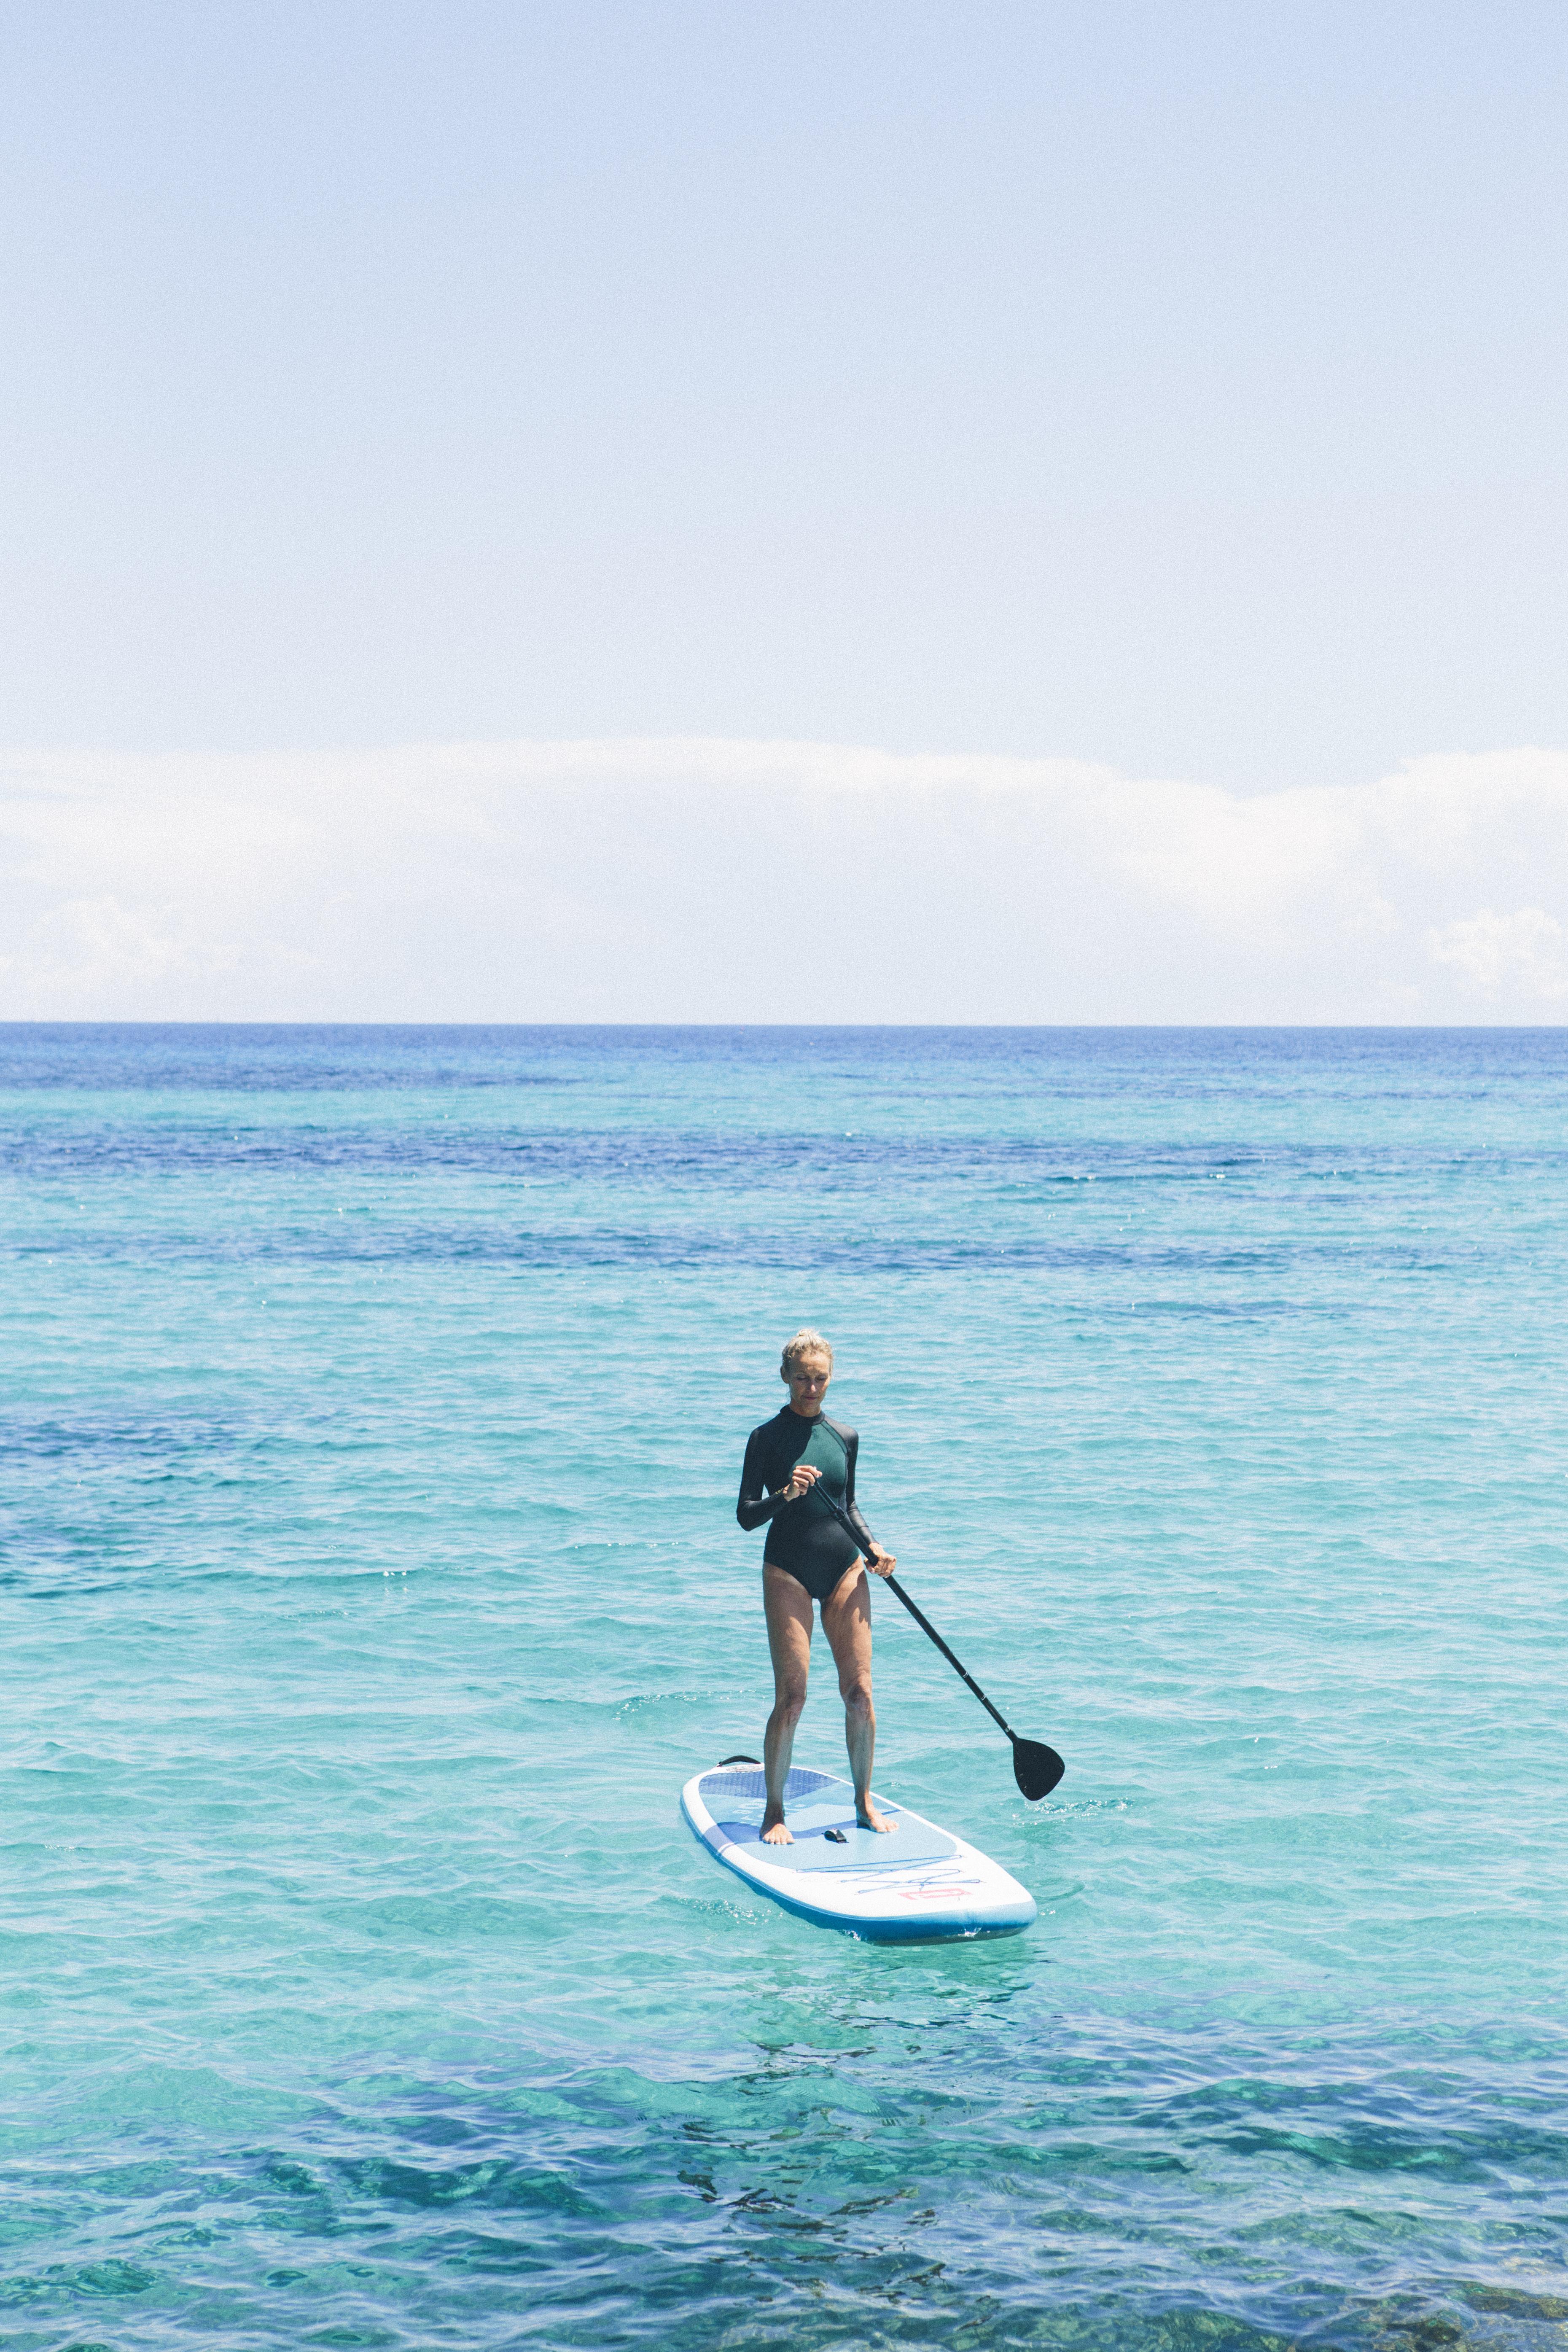 Paddleboard to practice balance